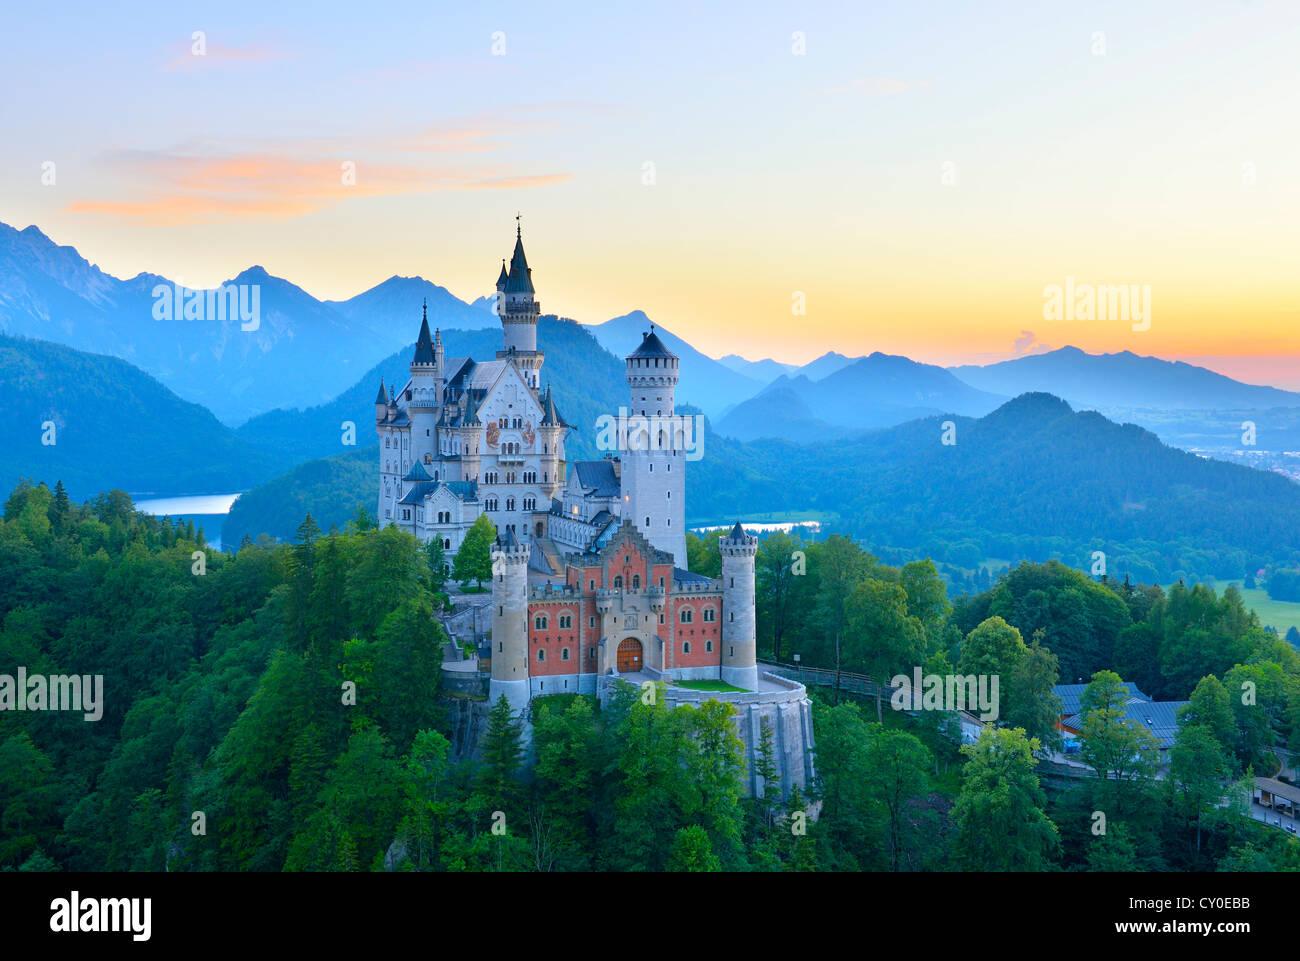 Schloss Neuschwanstein Castle, near Fuessen, Ostallgaeu, Allgaeu, Bavaria - Stock Image